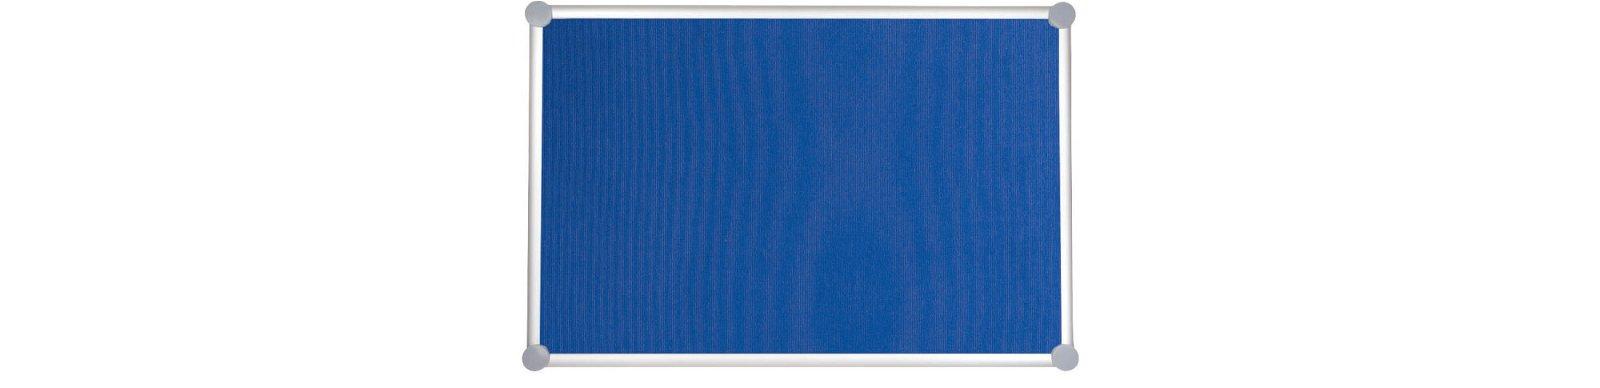 Pinnboard 2000 MAULpro, Textil, 90x180 cm, blau